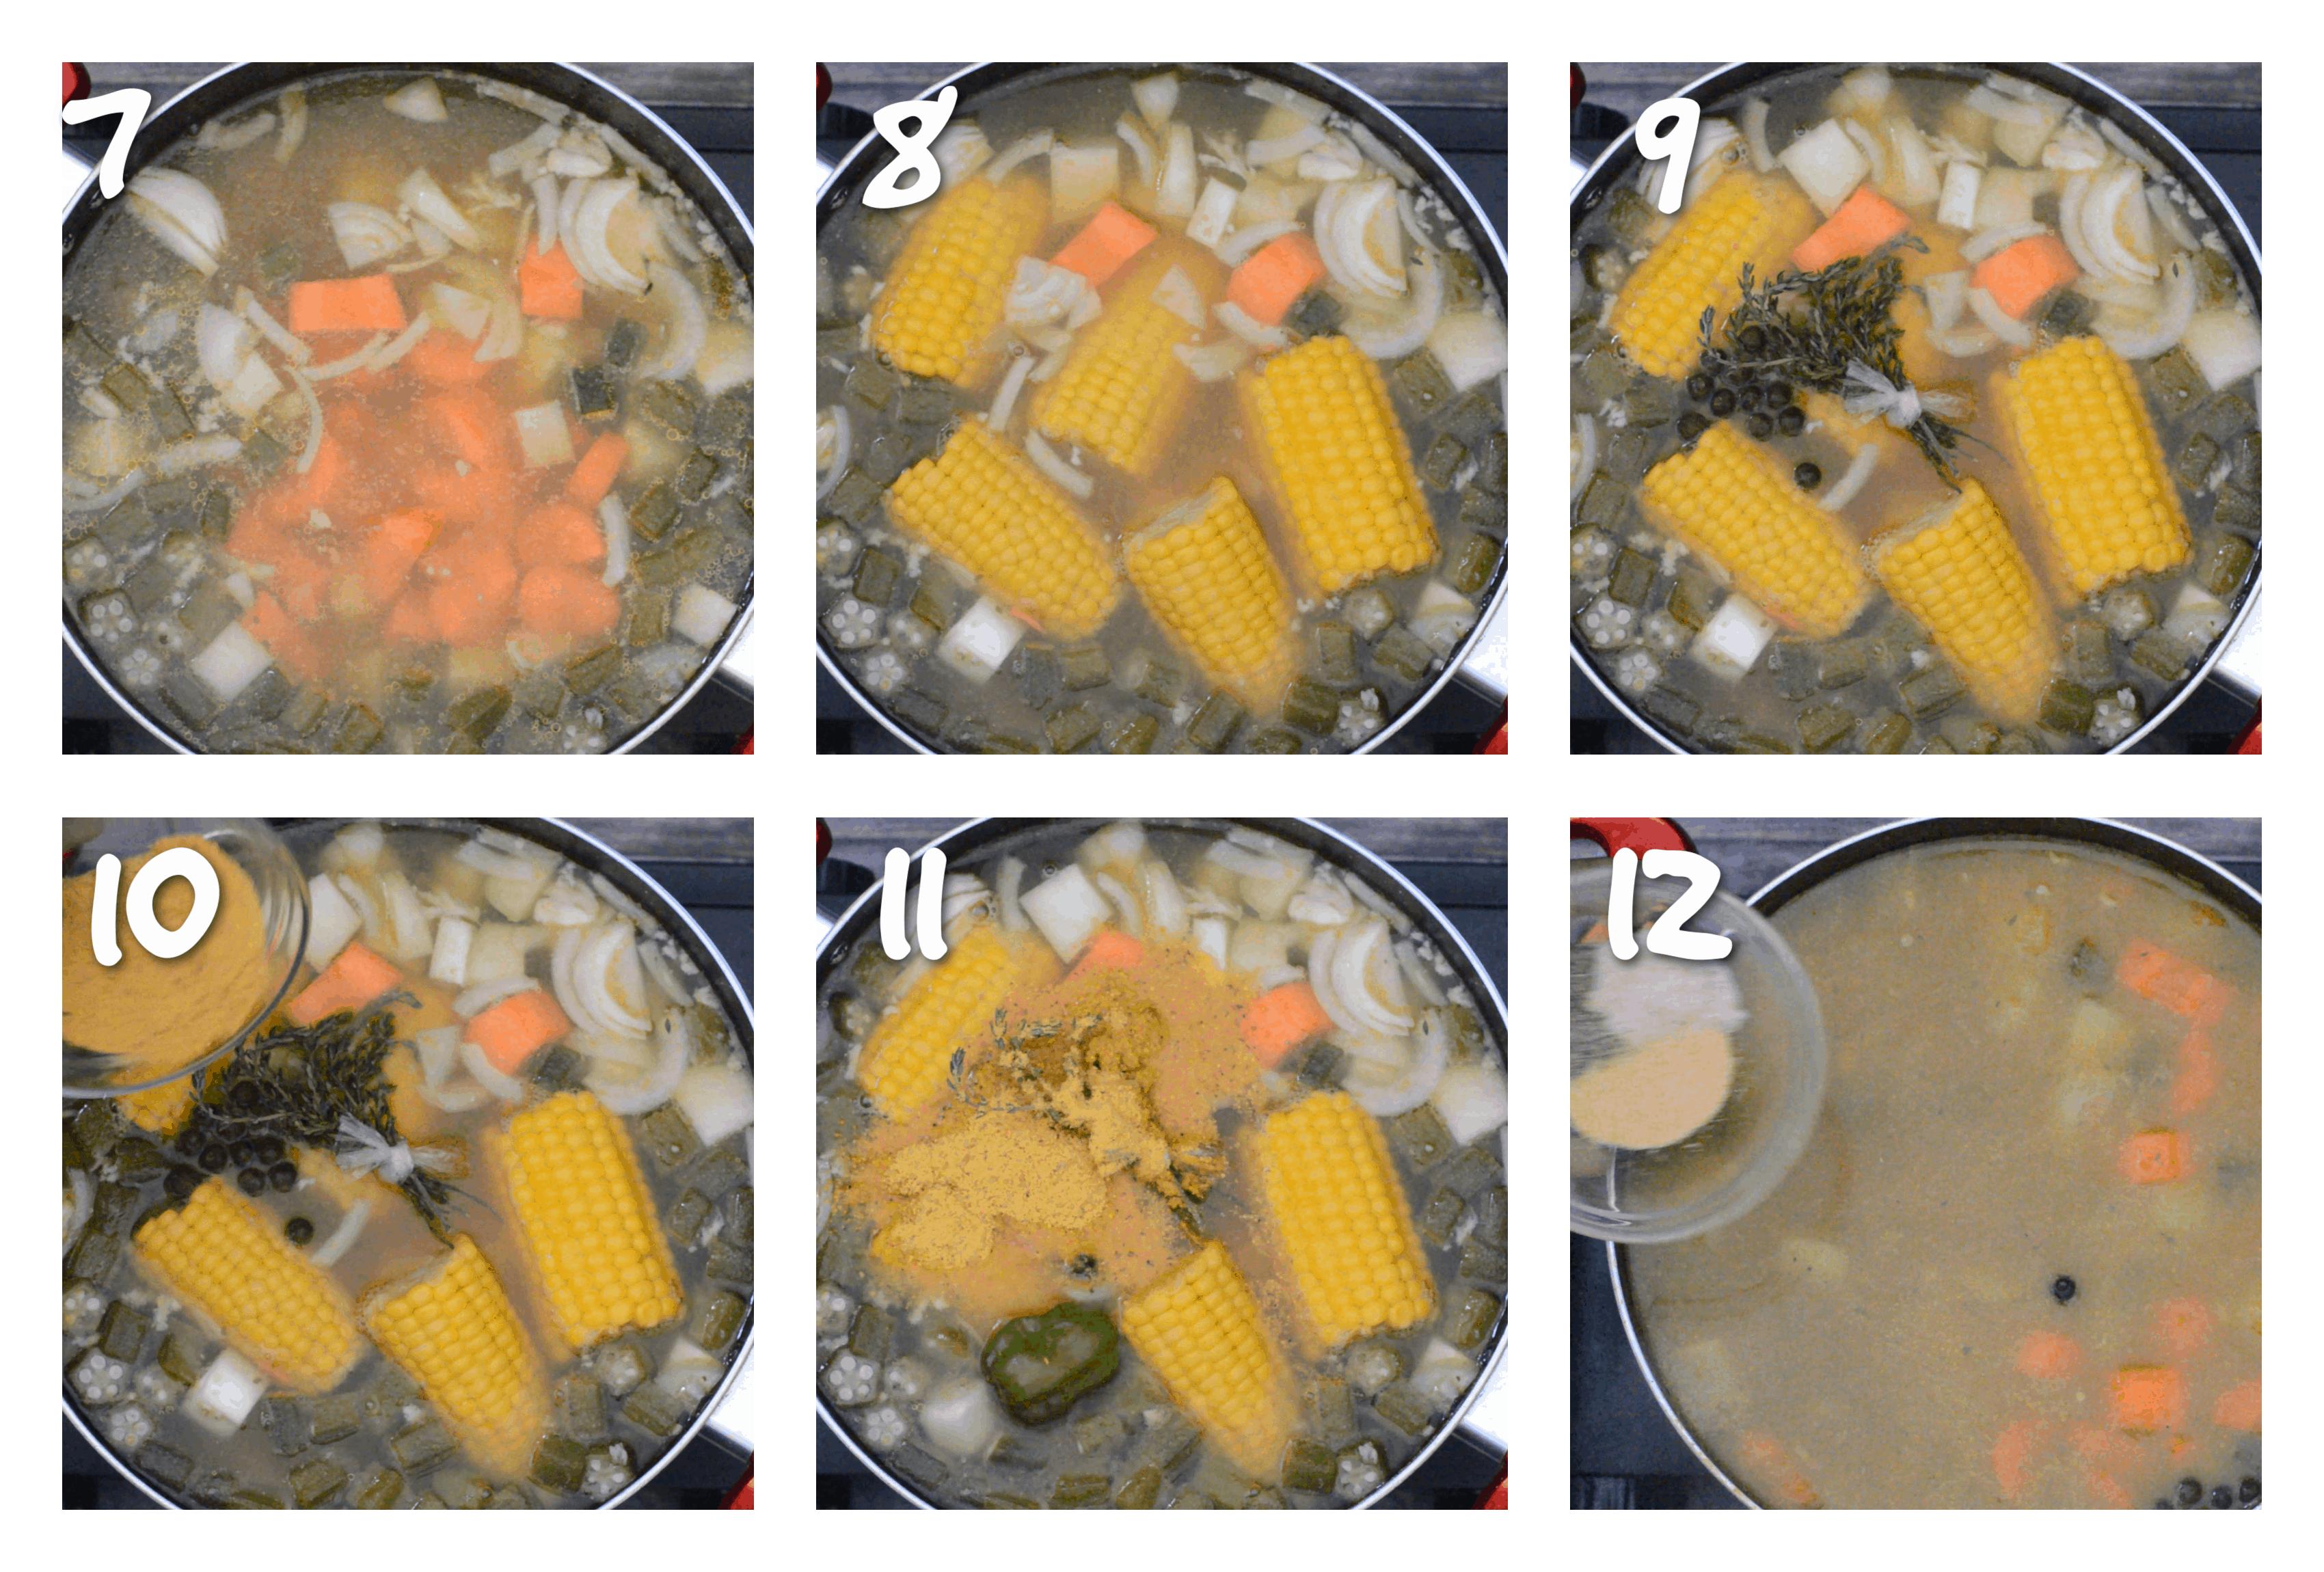 steps1-12 adding the vegetables